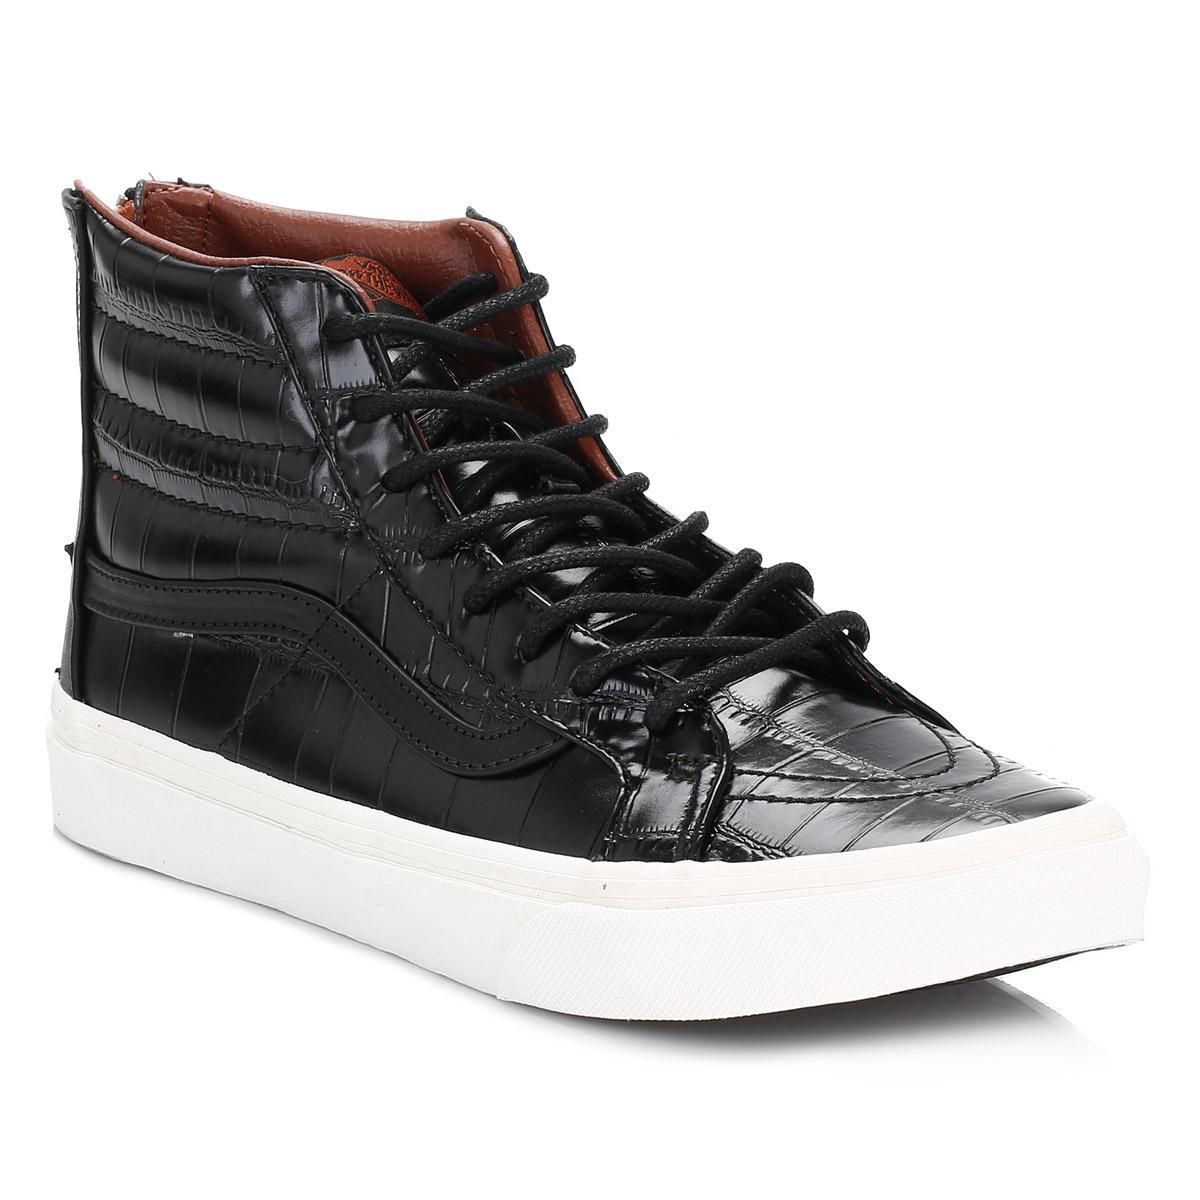 d70fc95323 Lyst - Vans Womens Black Croc Leather Sk8-hi Slim Trainers in Black